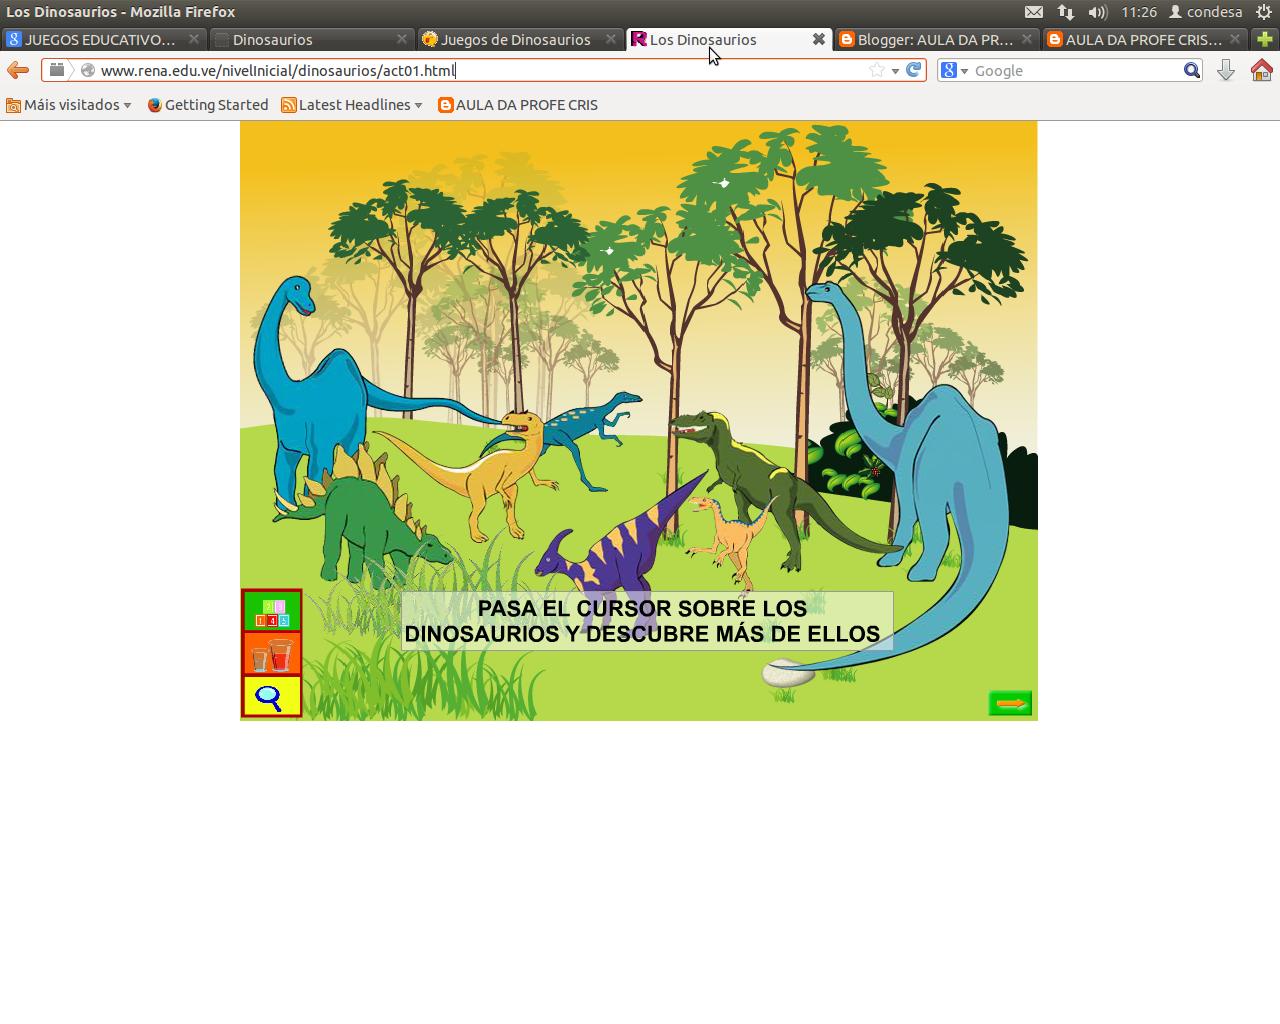 http://www.rena.edu.ve/nivelInicial/dinosaurios/act01.html